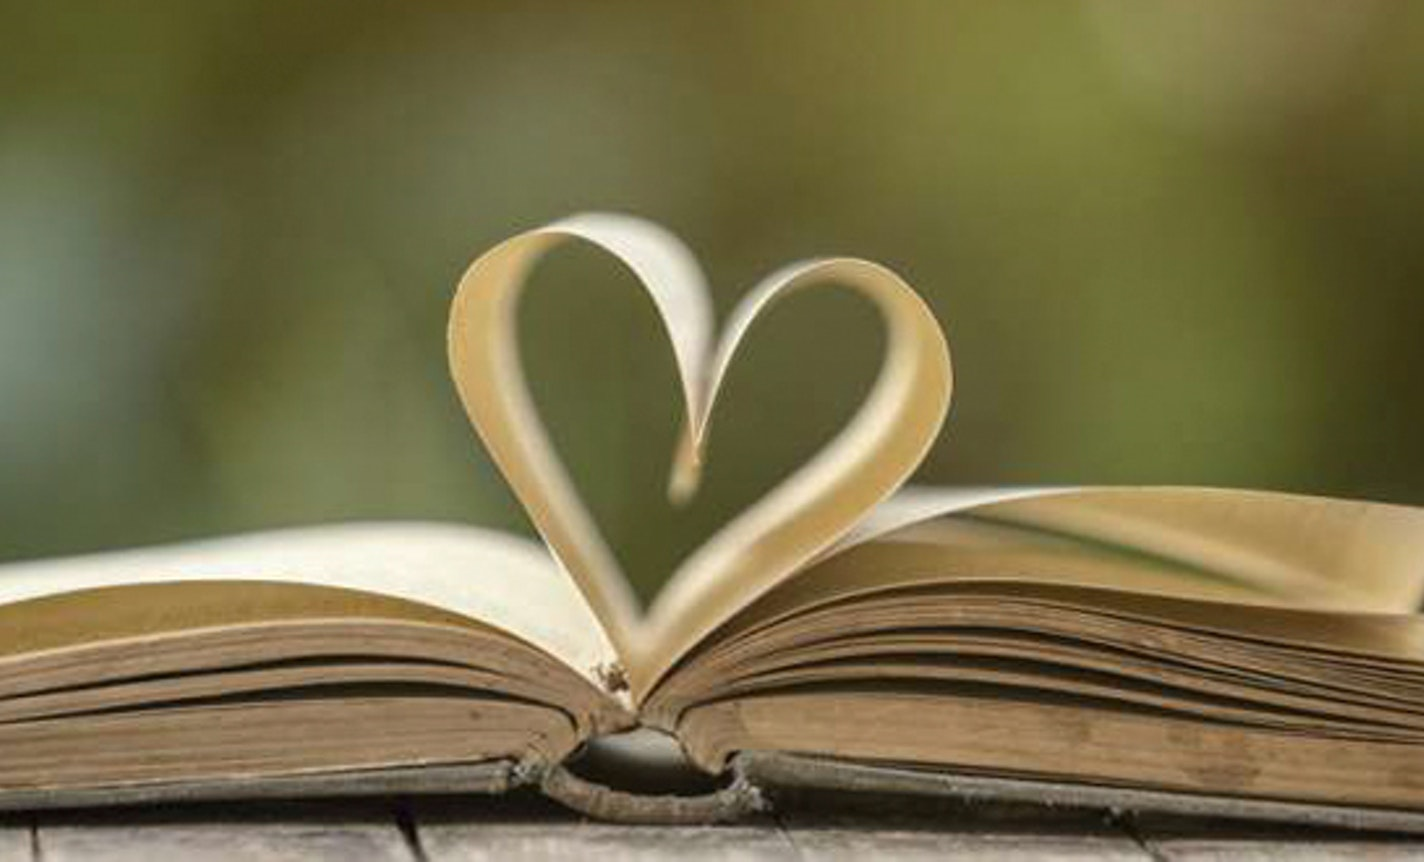 Loss, Losing, & Loosening: Grief & Healing through Poetry